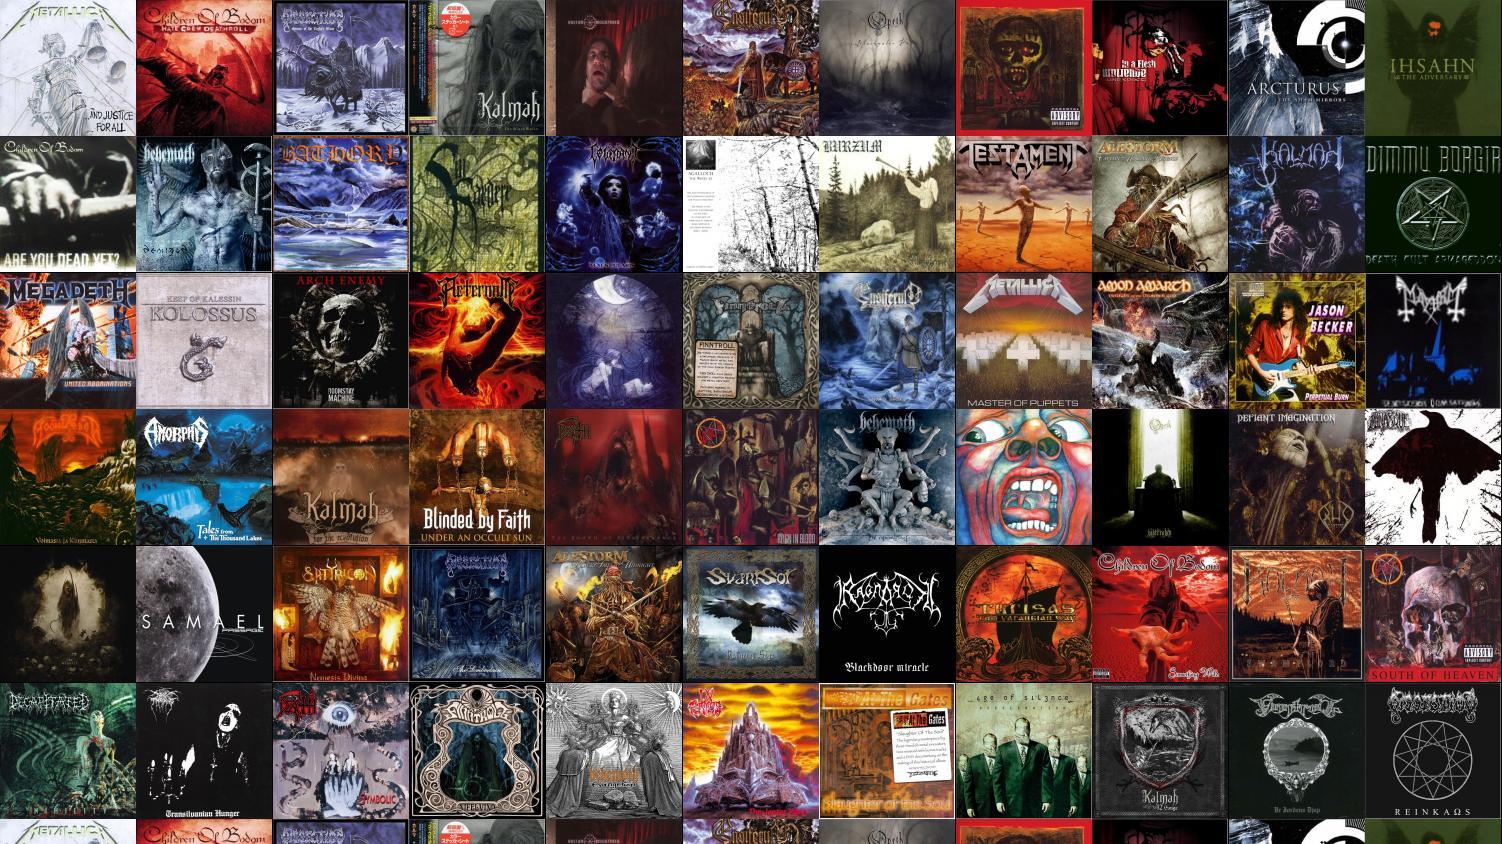 Metallica And Justice For All Children Bodom Hatecrew Wallpaper 1502x844